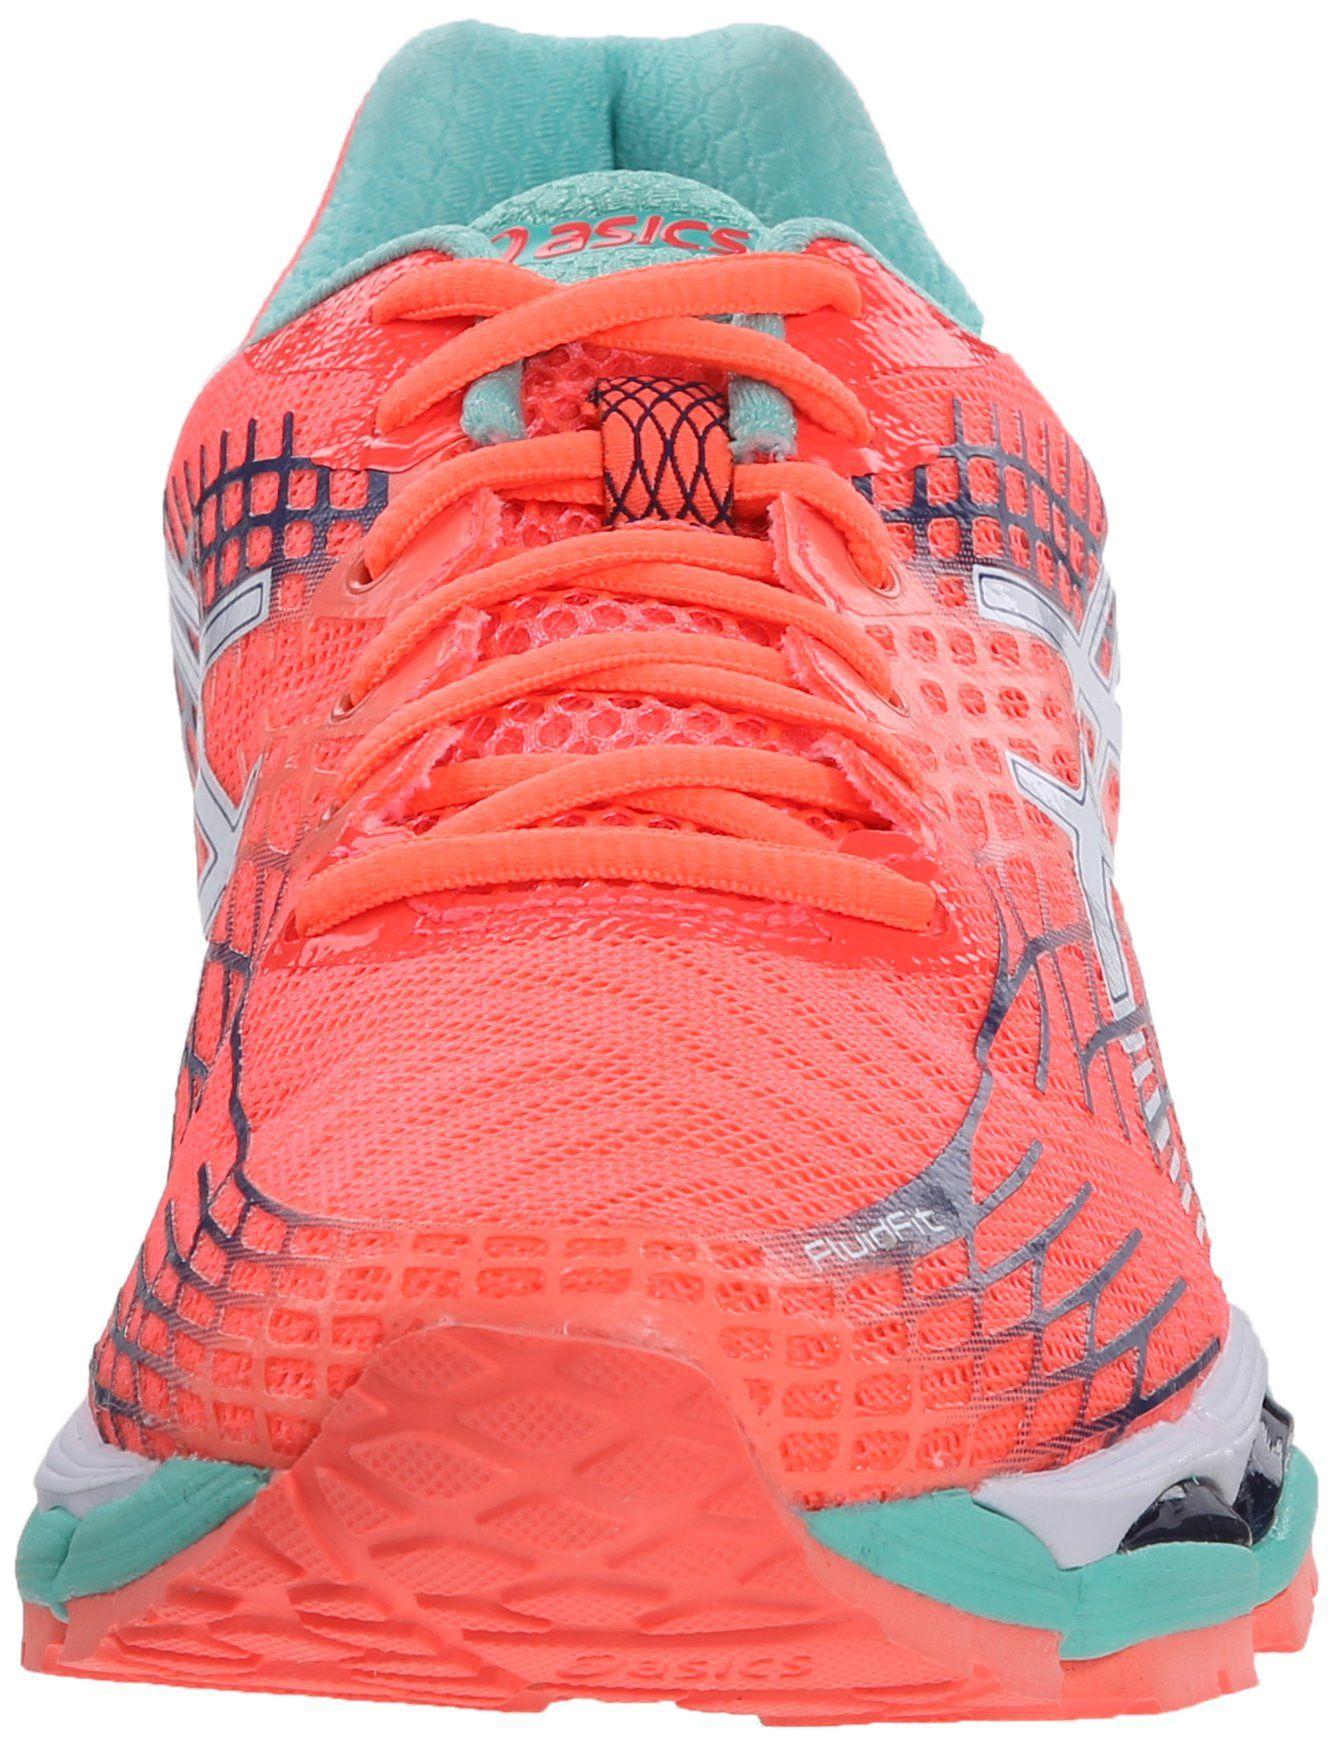 fefe0764e95e6 ASICS Women's GEL-Nimbus 17 Running Shoe | Amazon.com … | My Style ...